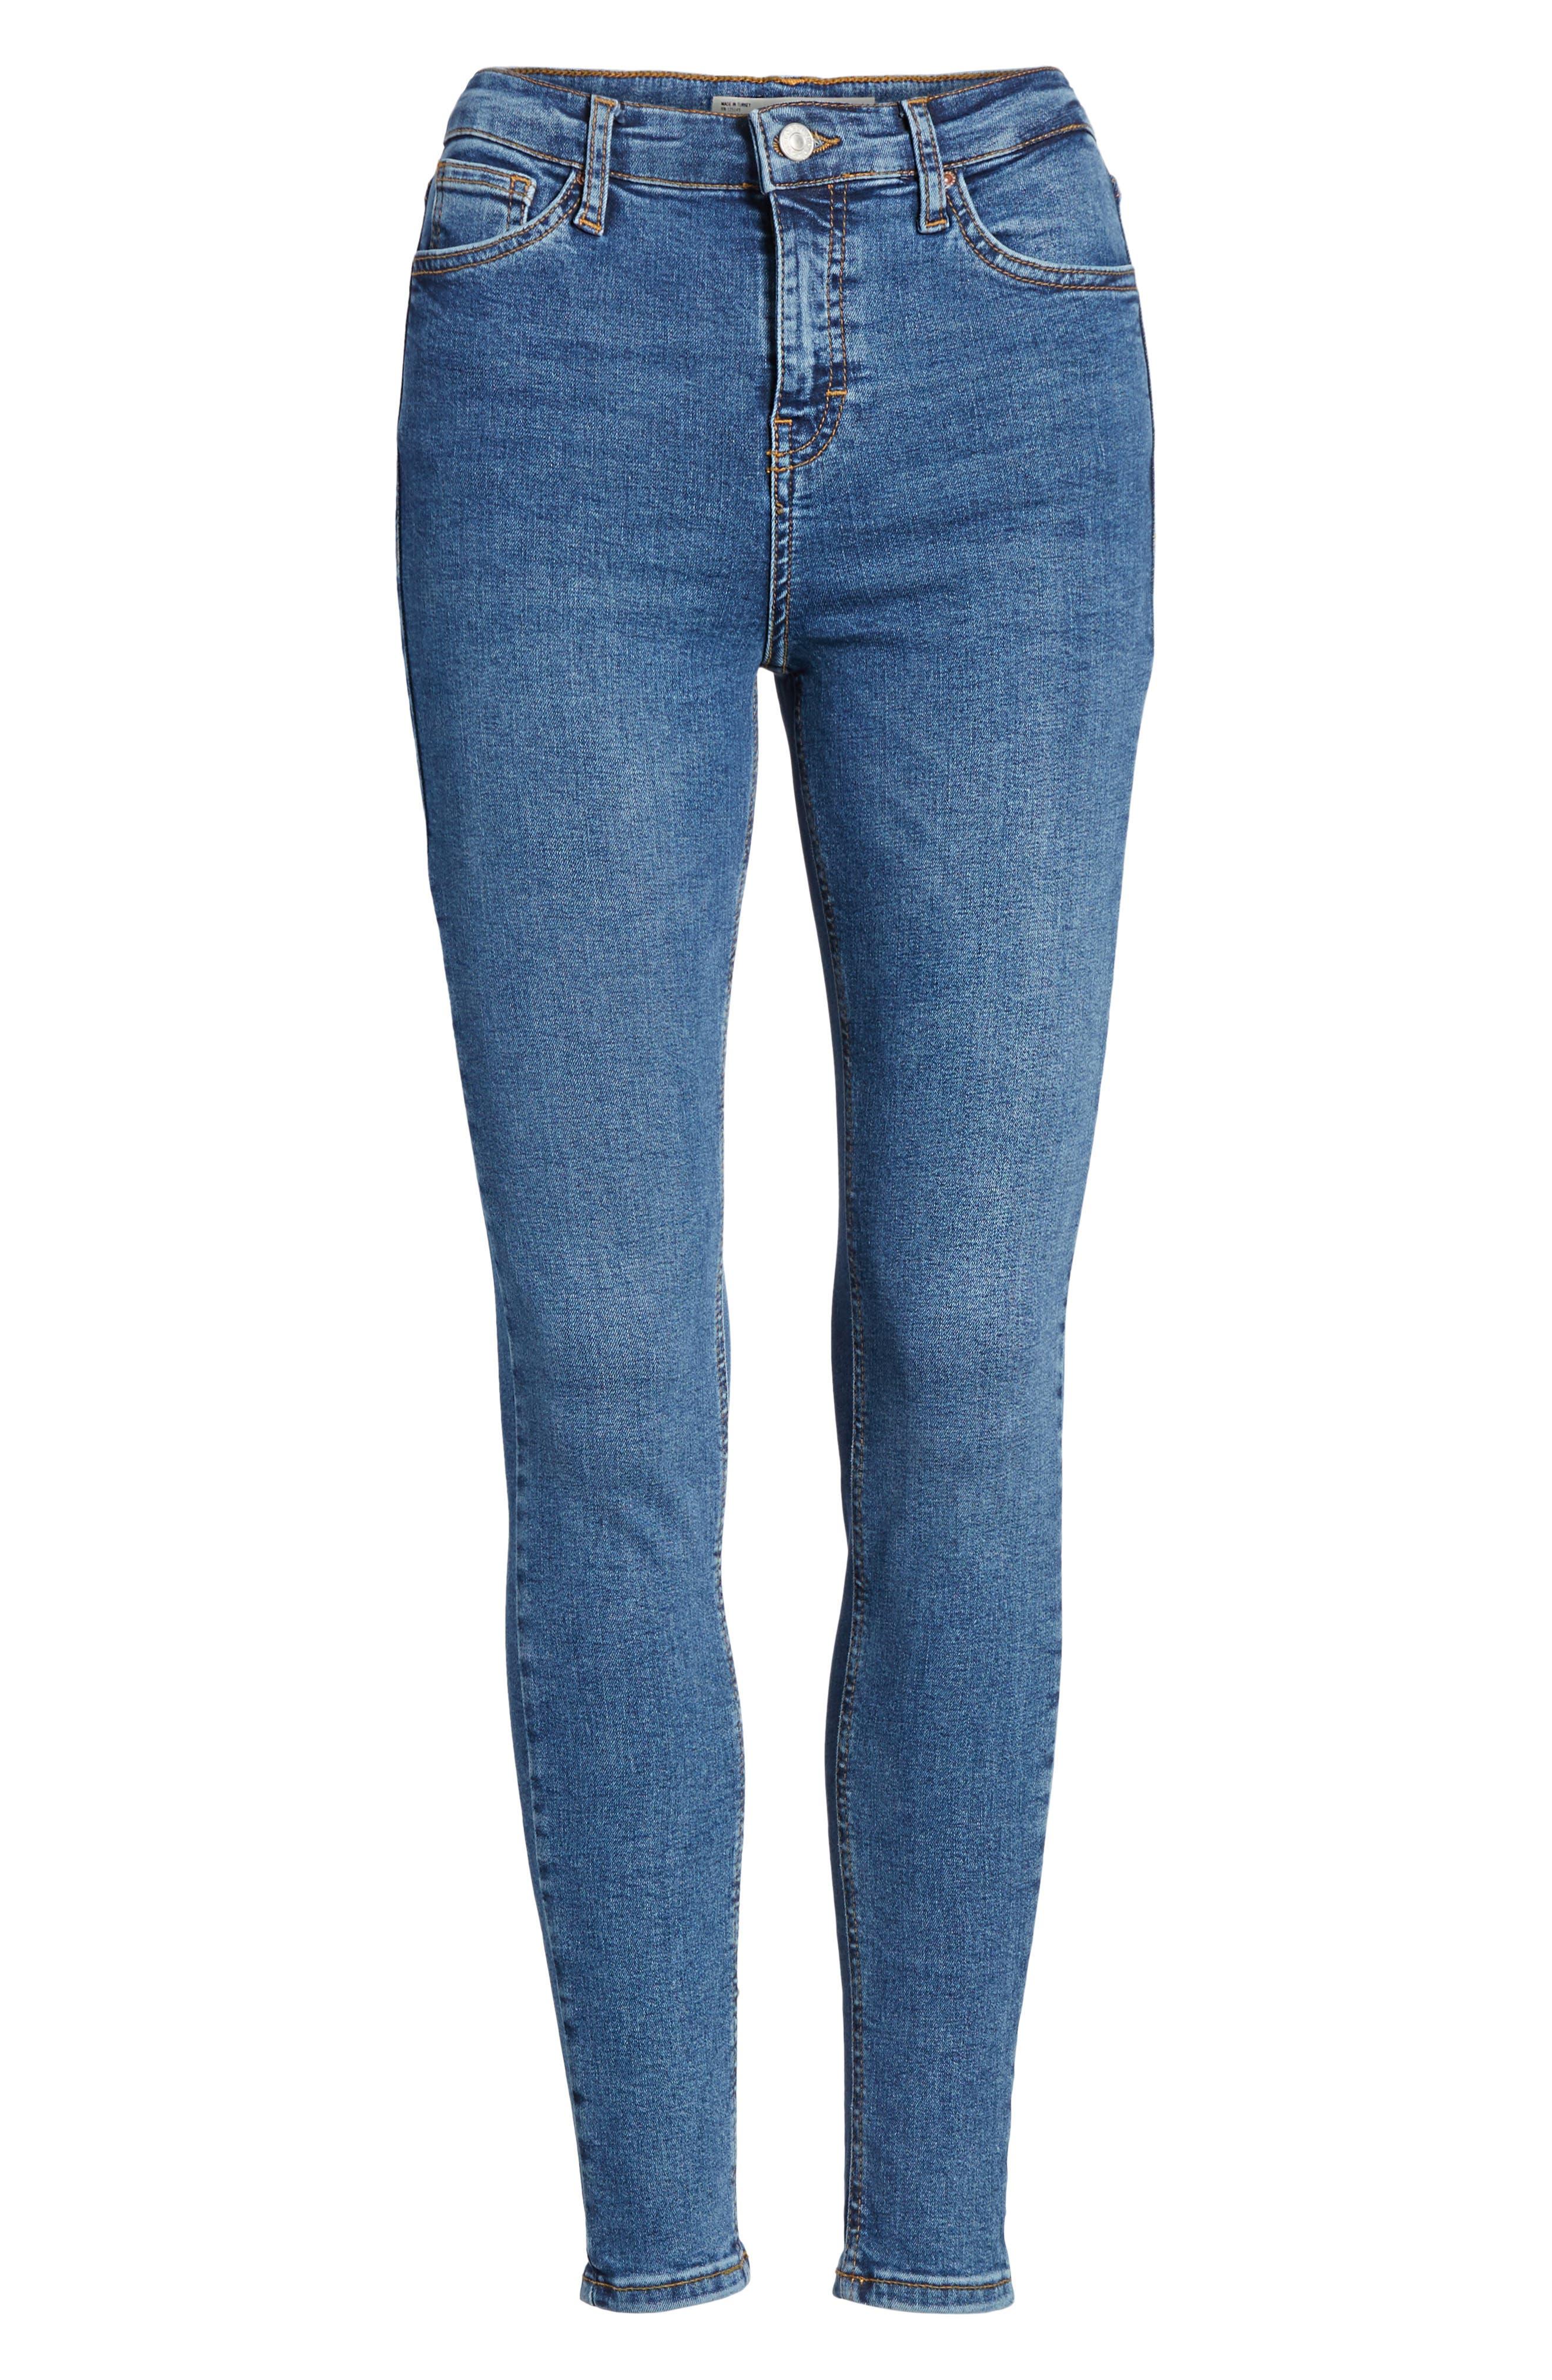 Jamie Indigo High Waist Skinny Jeans,                             Alternate thumbnail 7, color,                             401